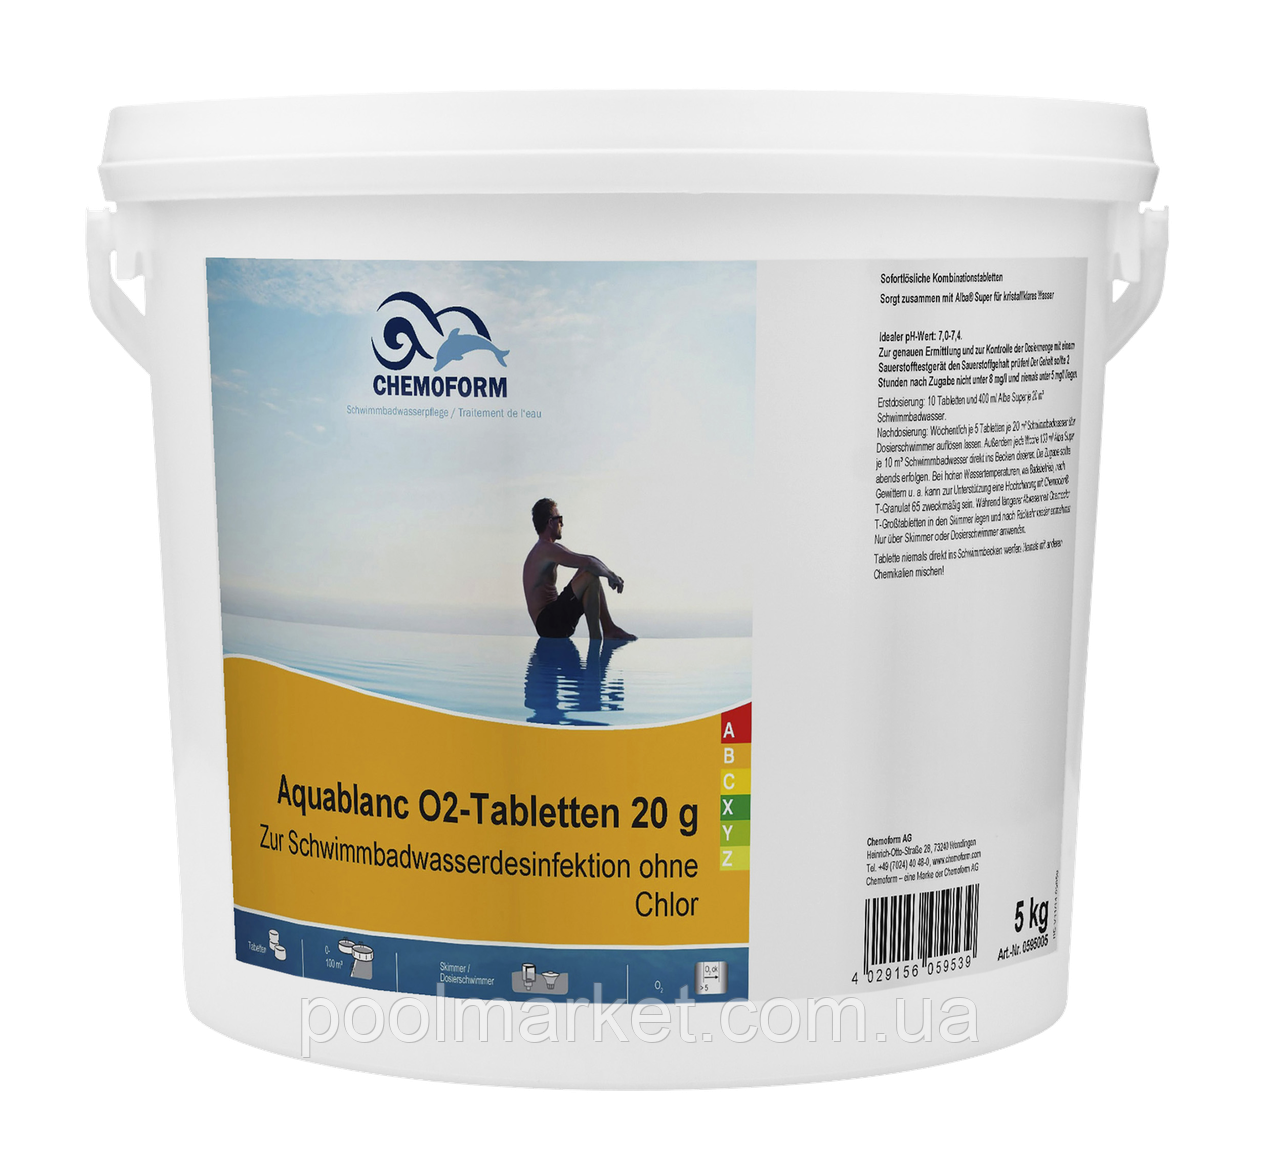 Aquablanc O2 (активный кислород таблетки 20г) 5кг